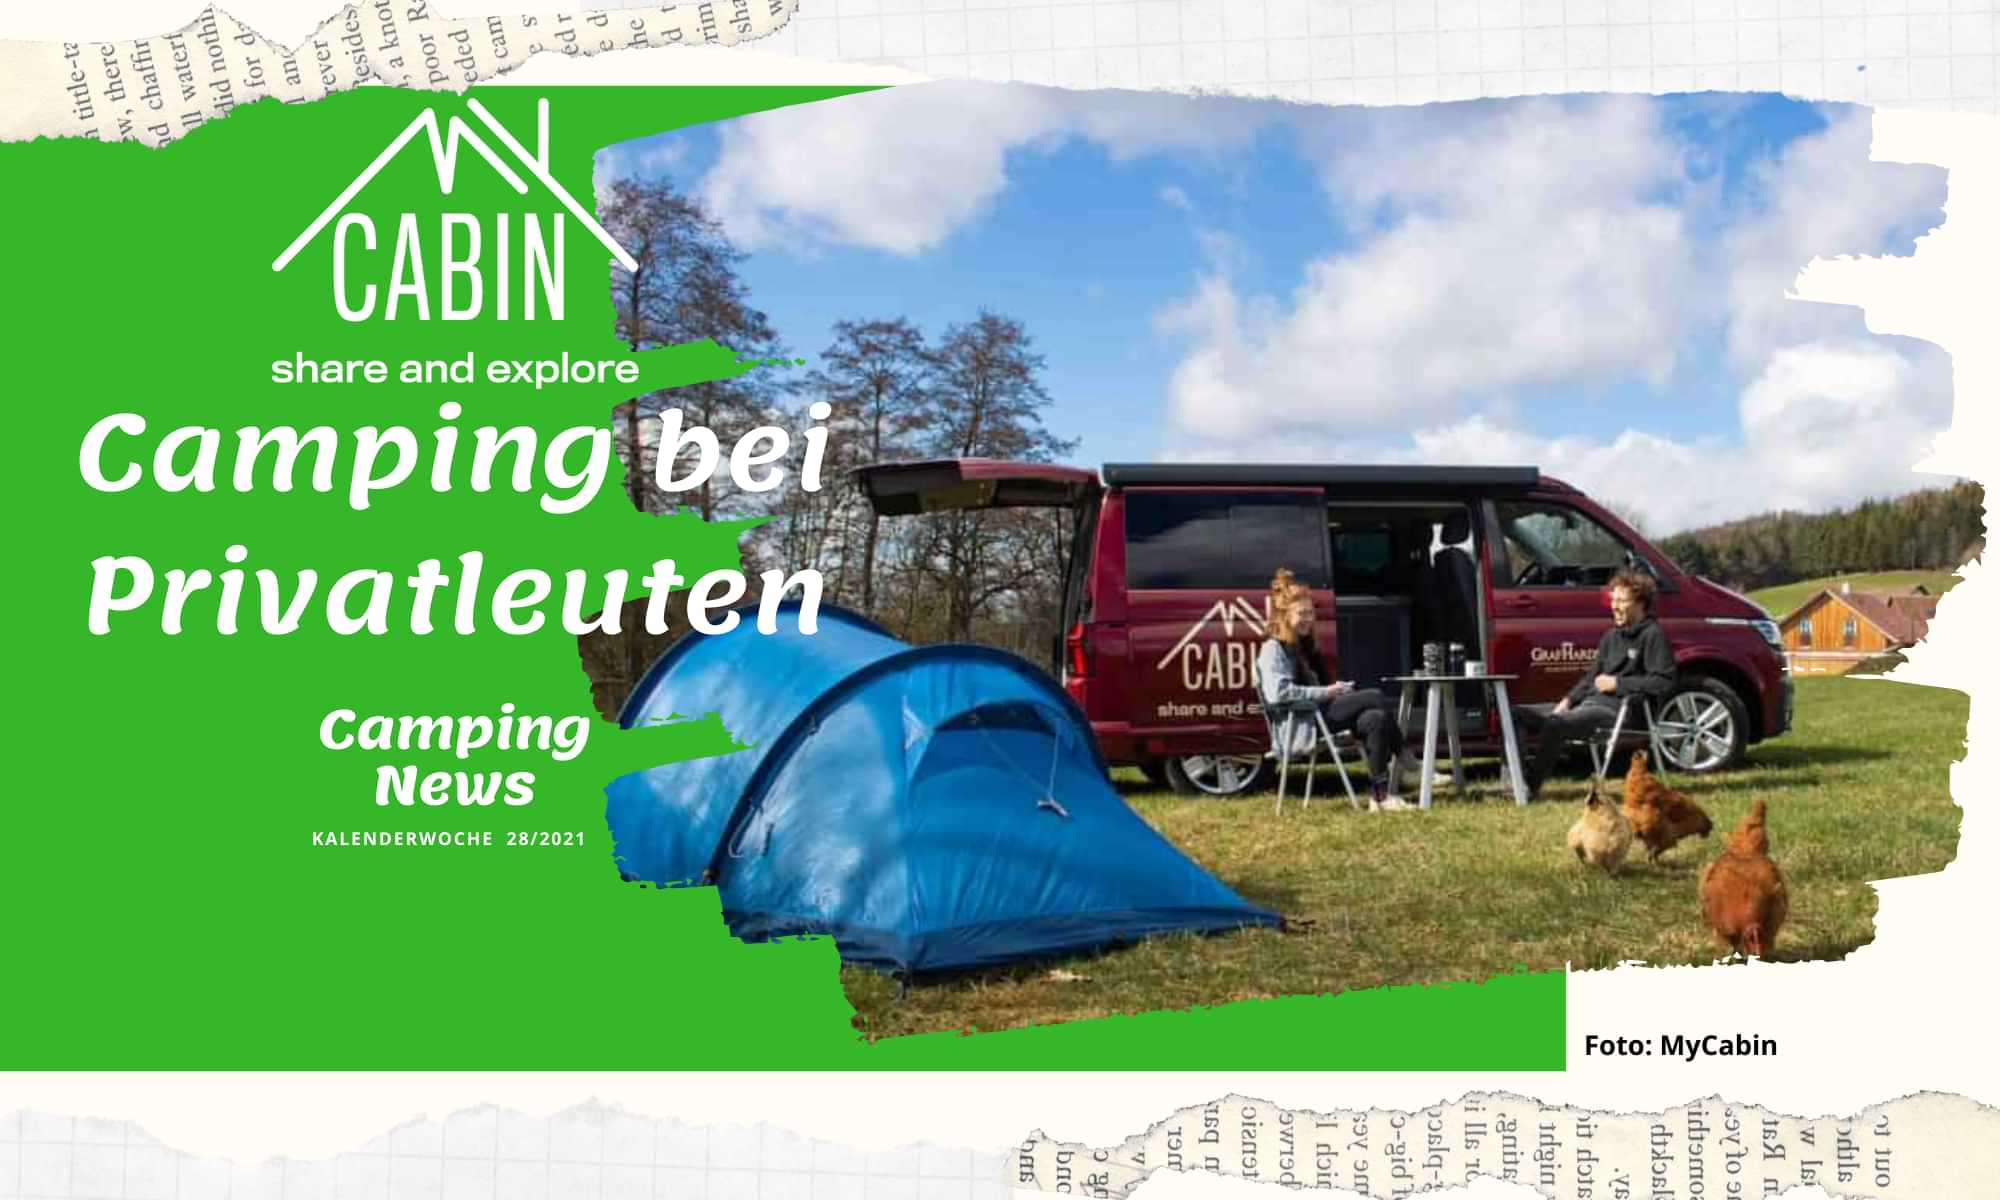 Camping bei Privatleuten – MyCabin vermittelt Übernachtungsplätze